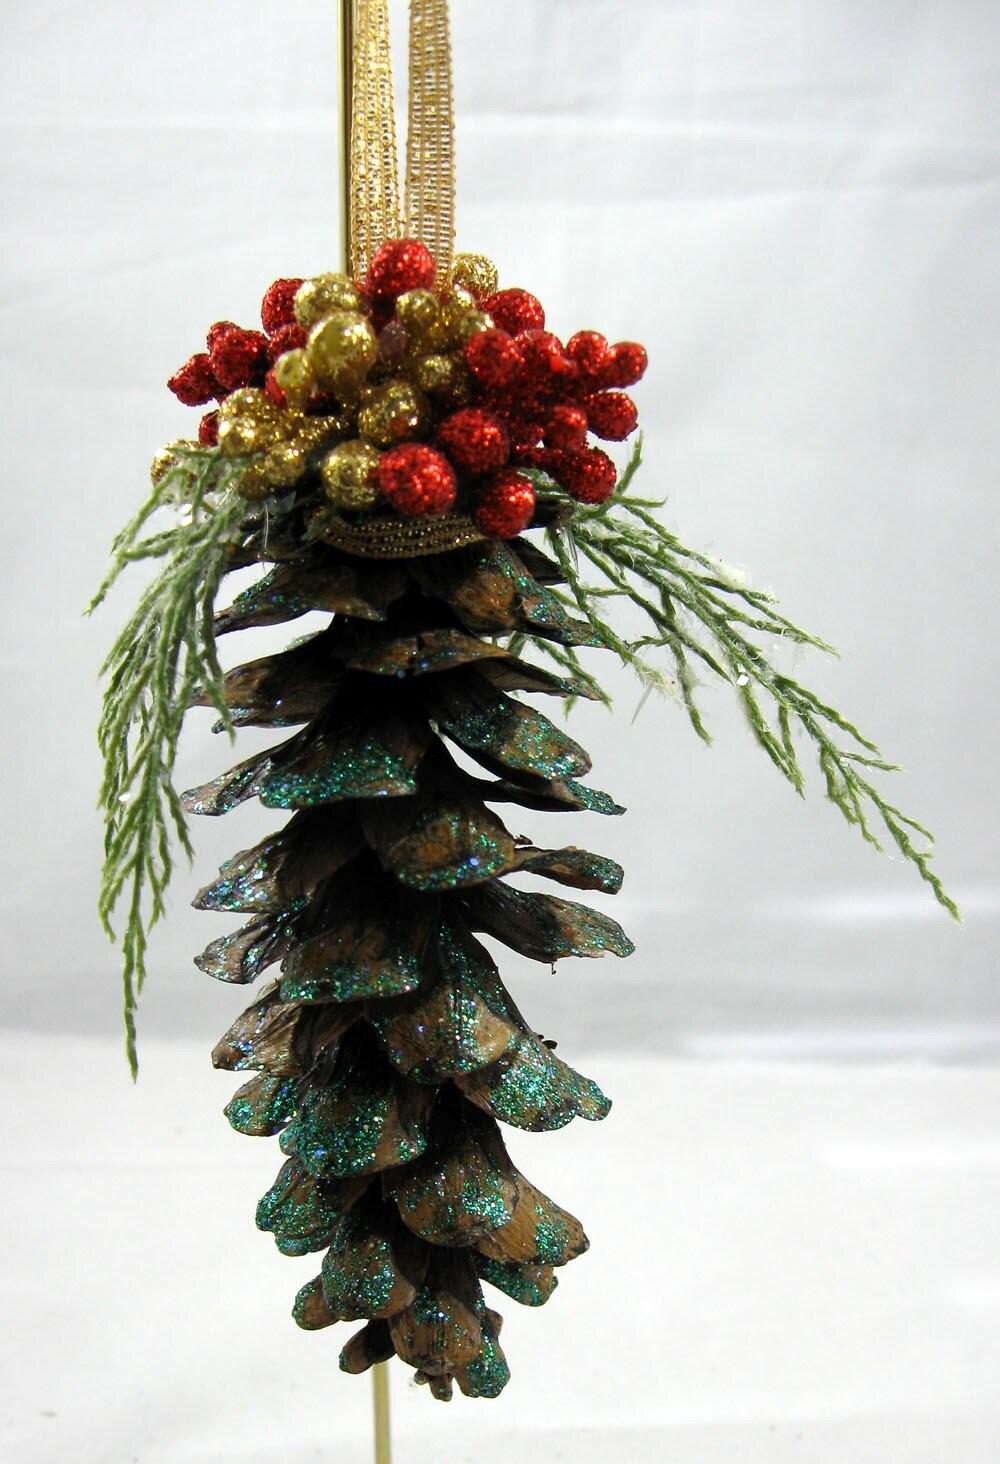 pine cone christmas ornament 102. Black Bedroom Furniture Sets. Home Design Ideas